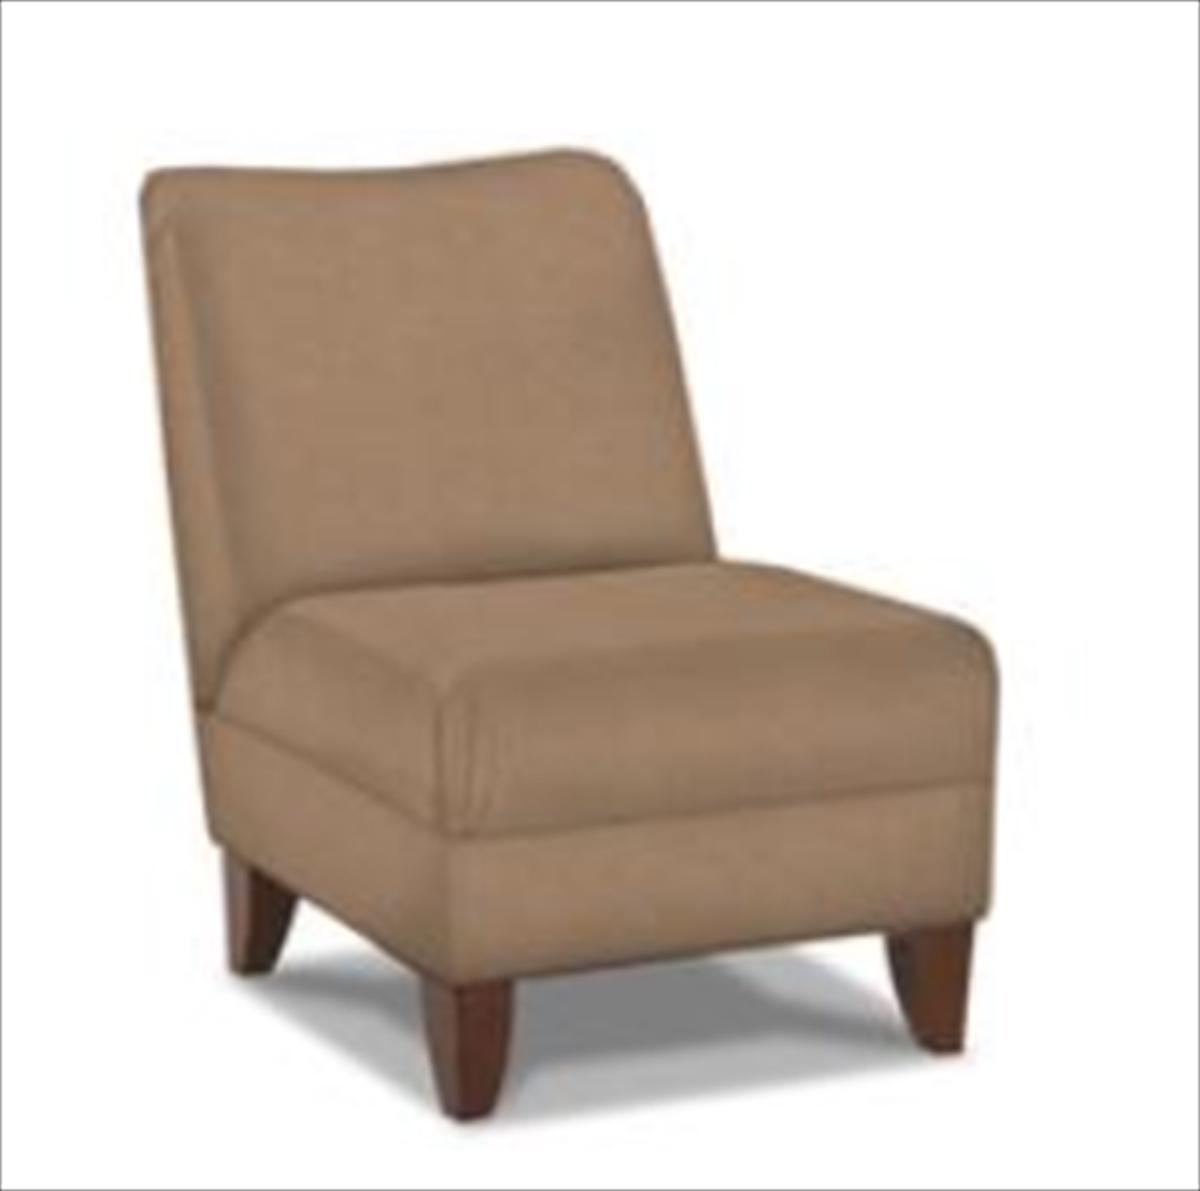 Klaussner Linus Armless Chair - Willow Bronze